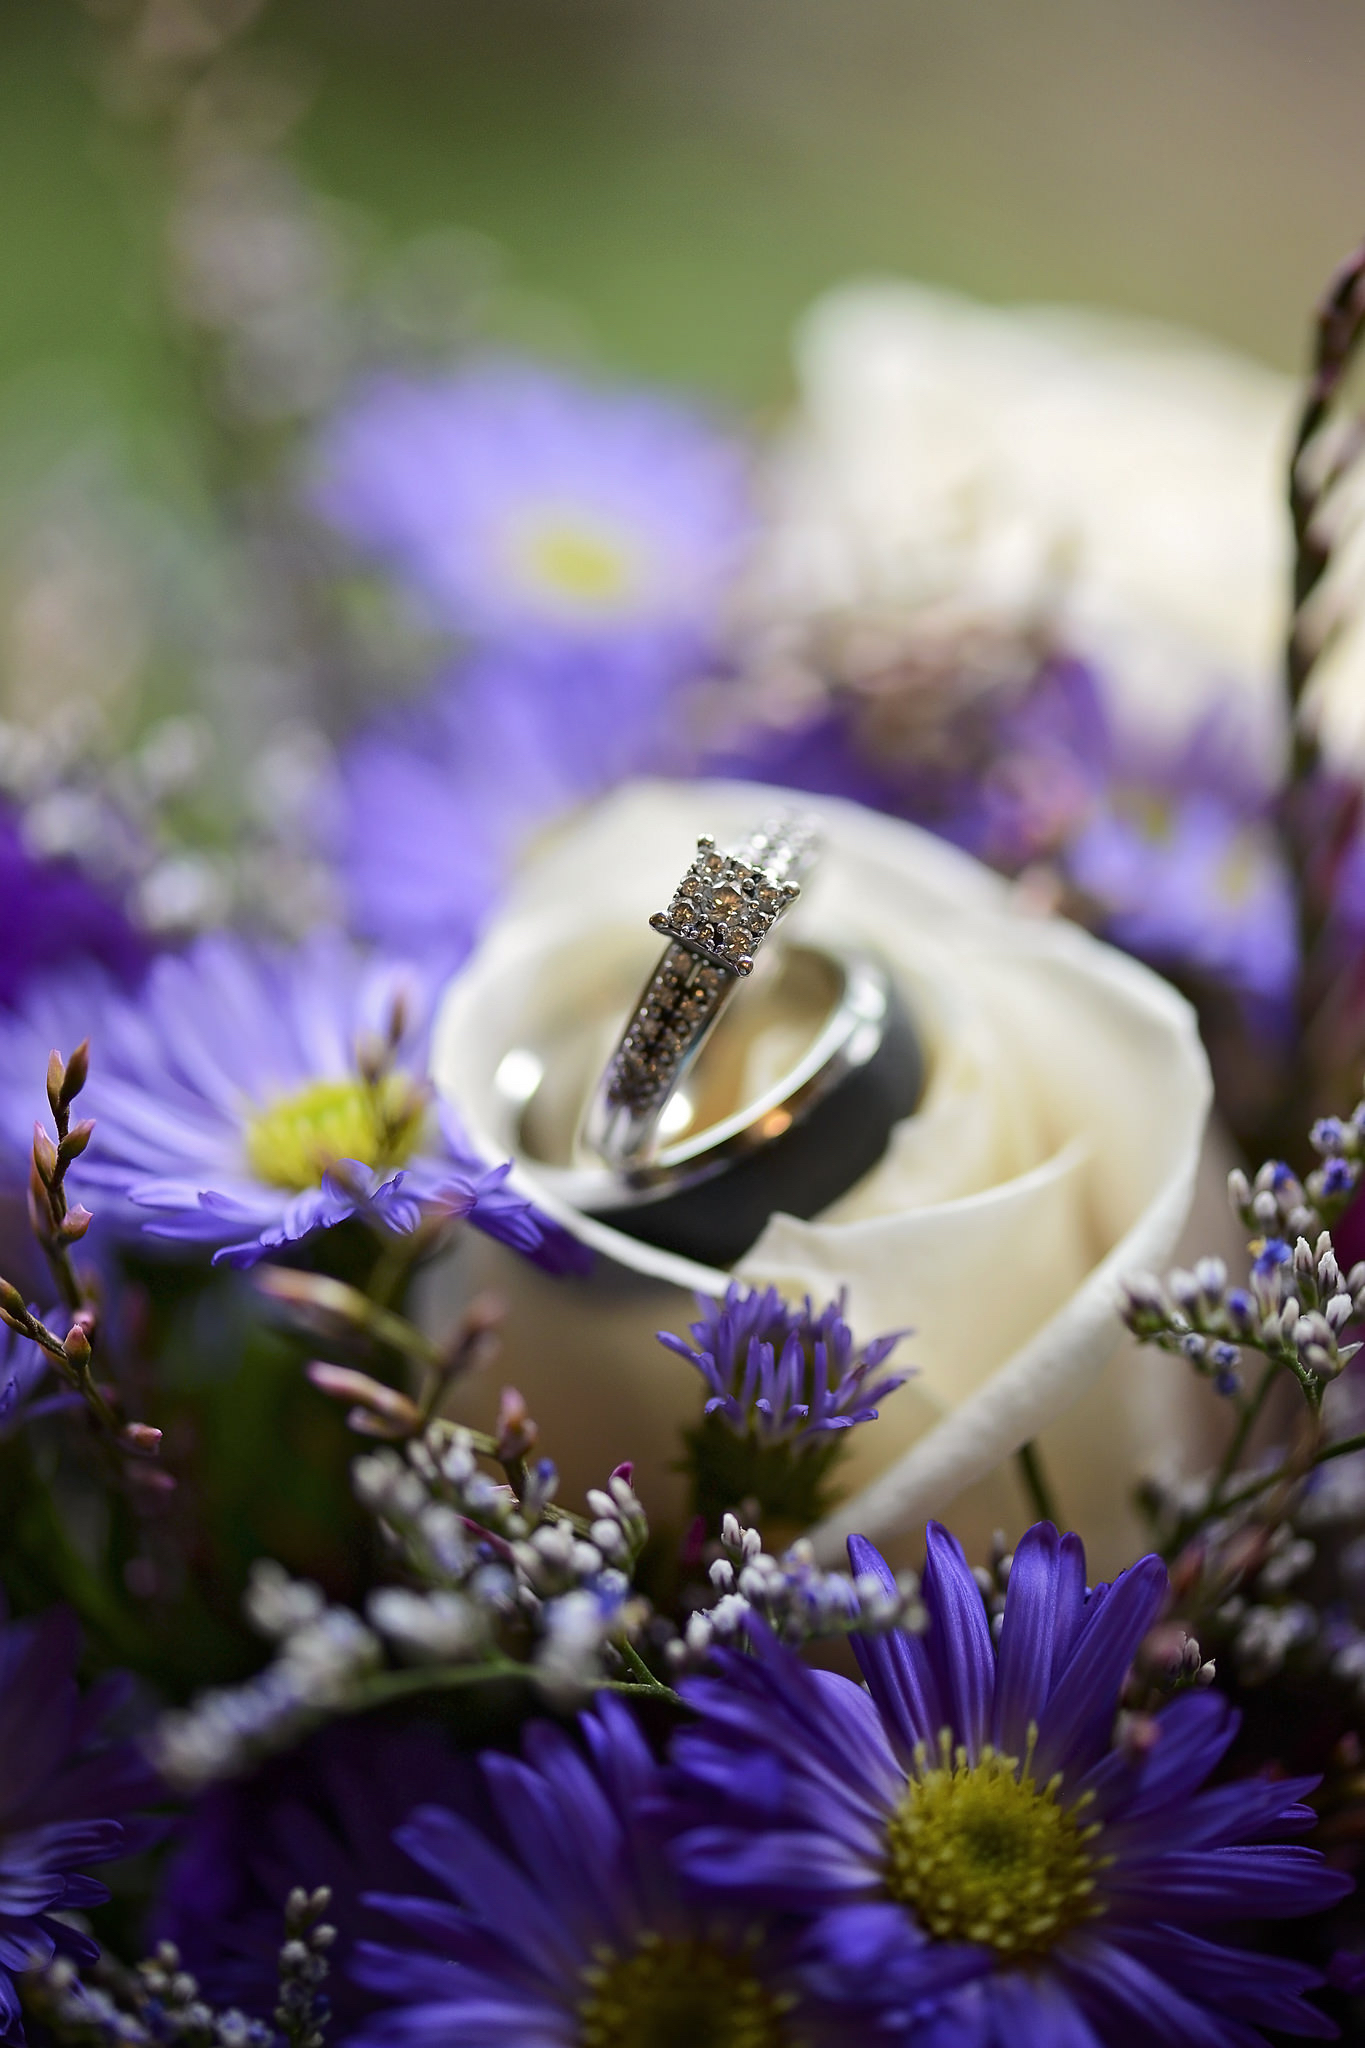 kristine_wedding_rings_spiritedtable_photo04.jpg